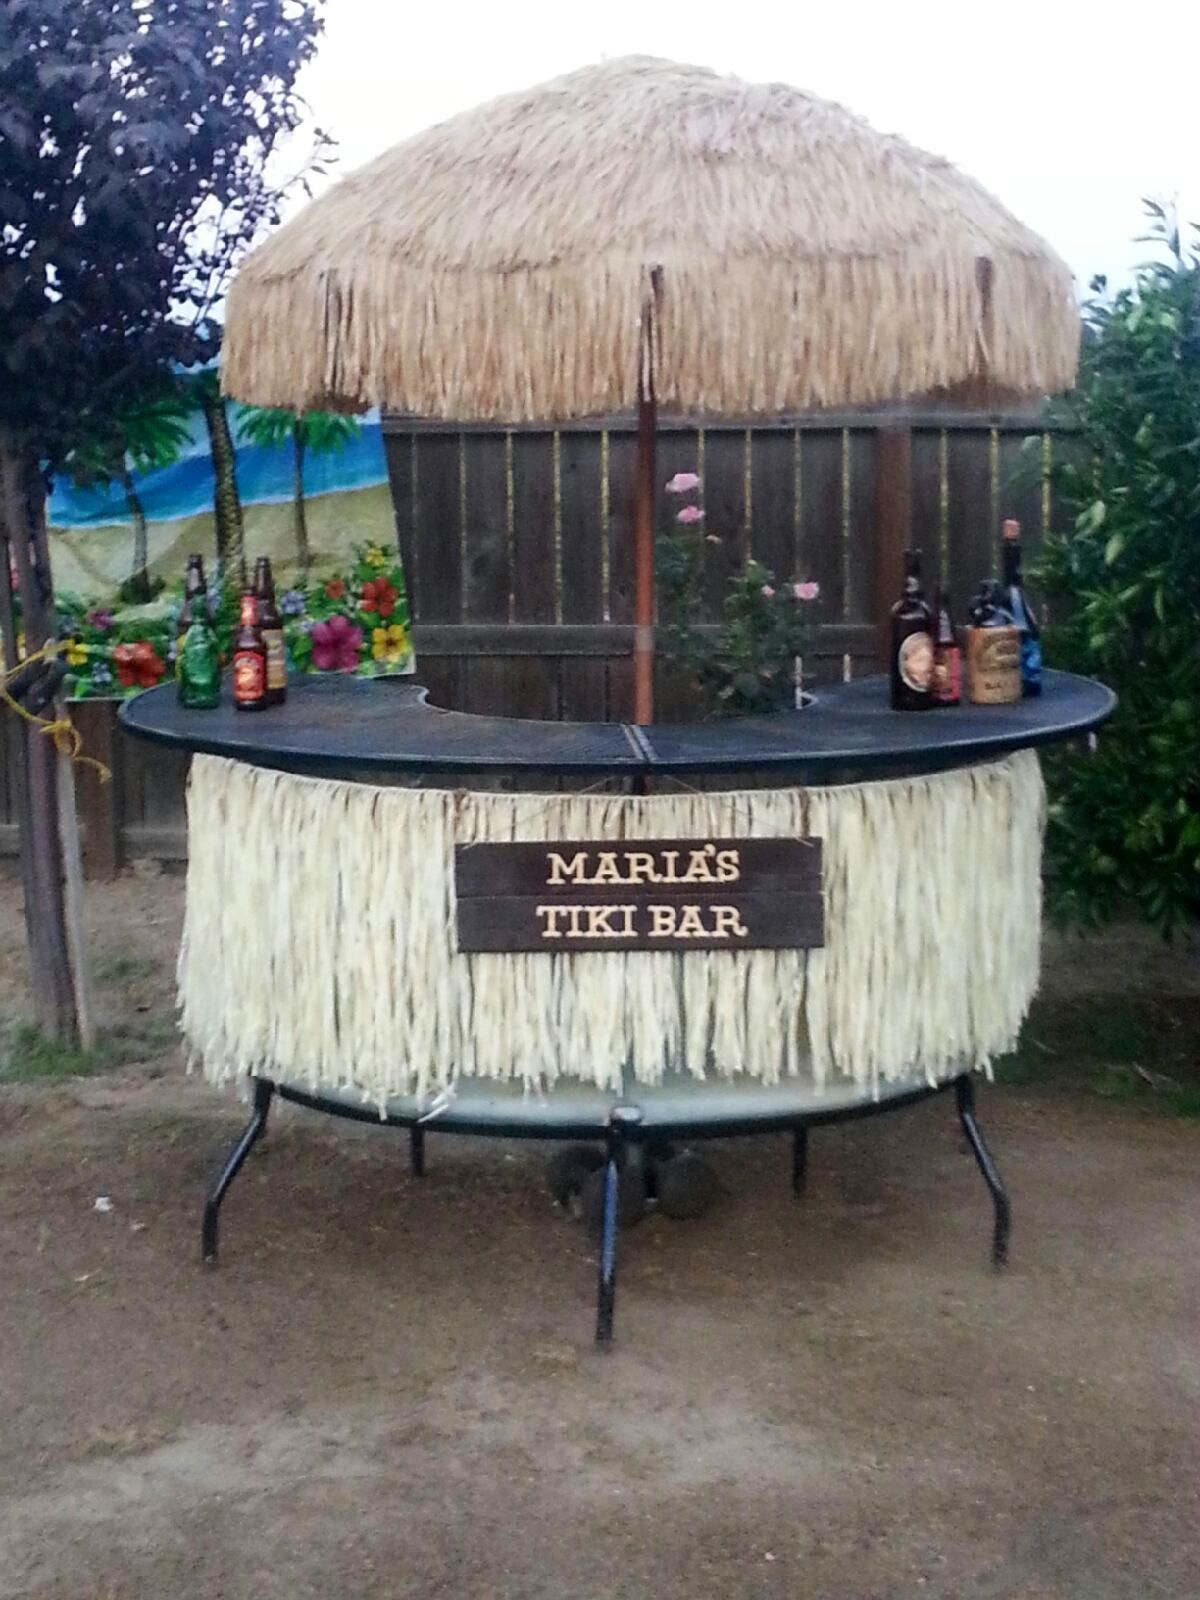 Genial DIY Tiki Bar For Your Backyard